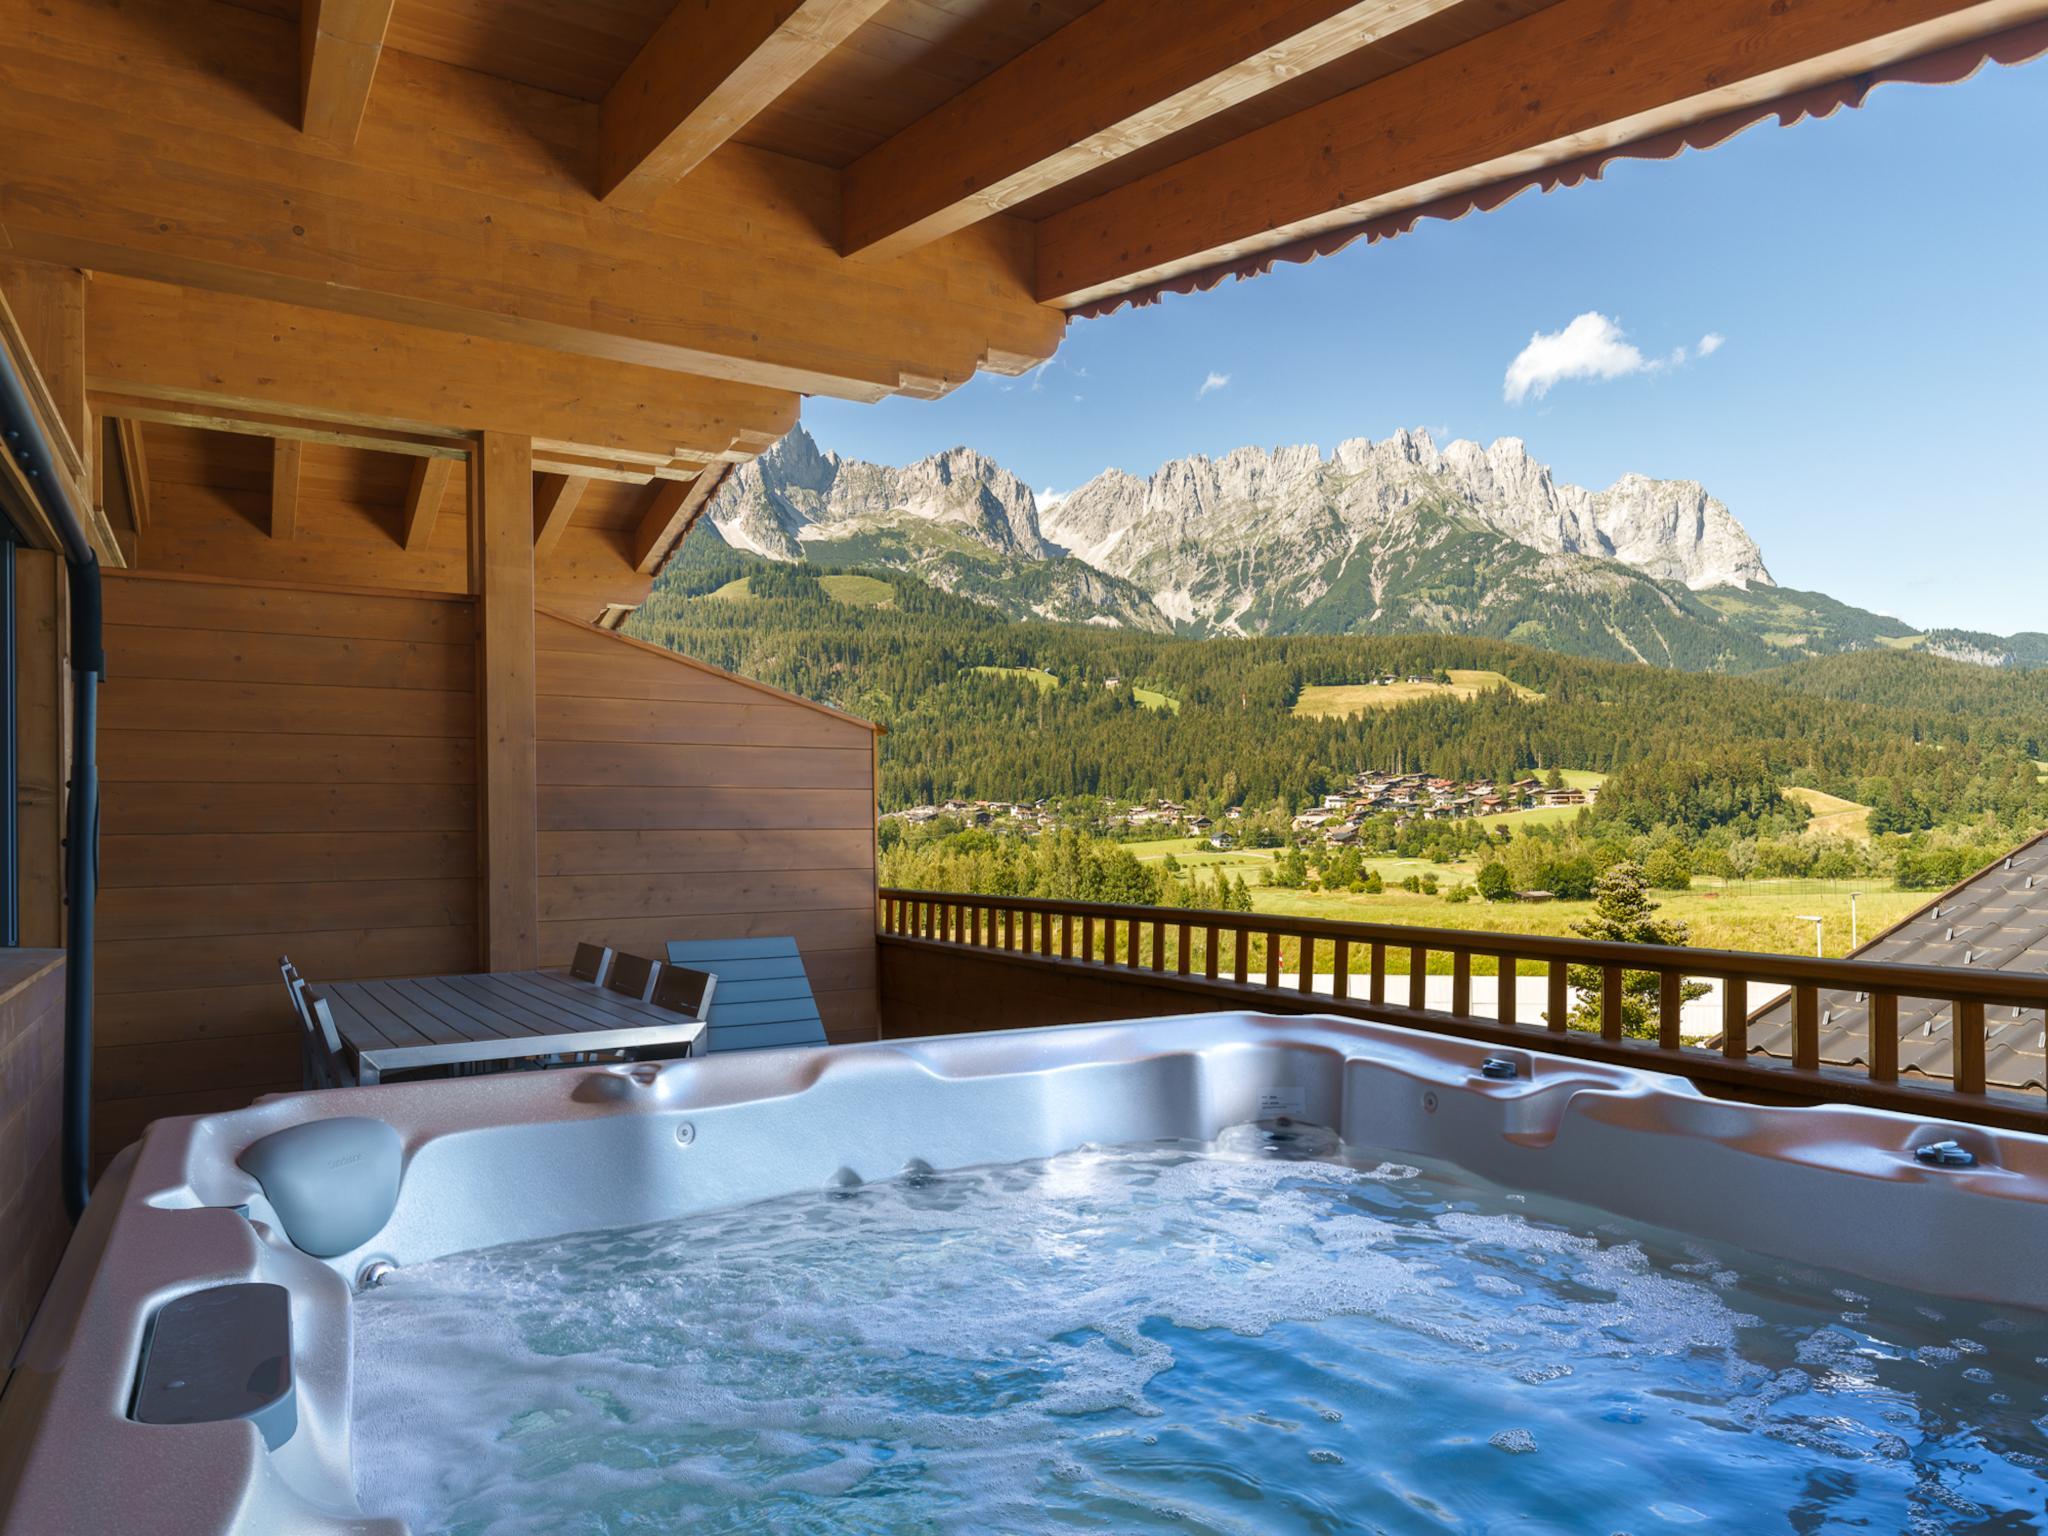 Alpen Panorama Wilder Kaiser 1 Tirol